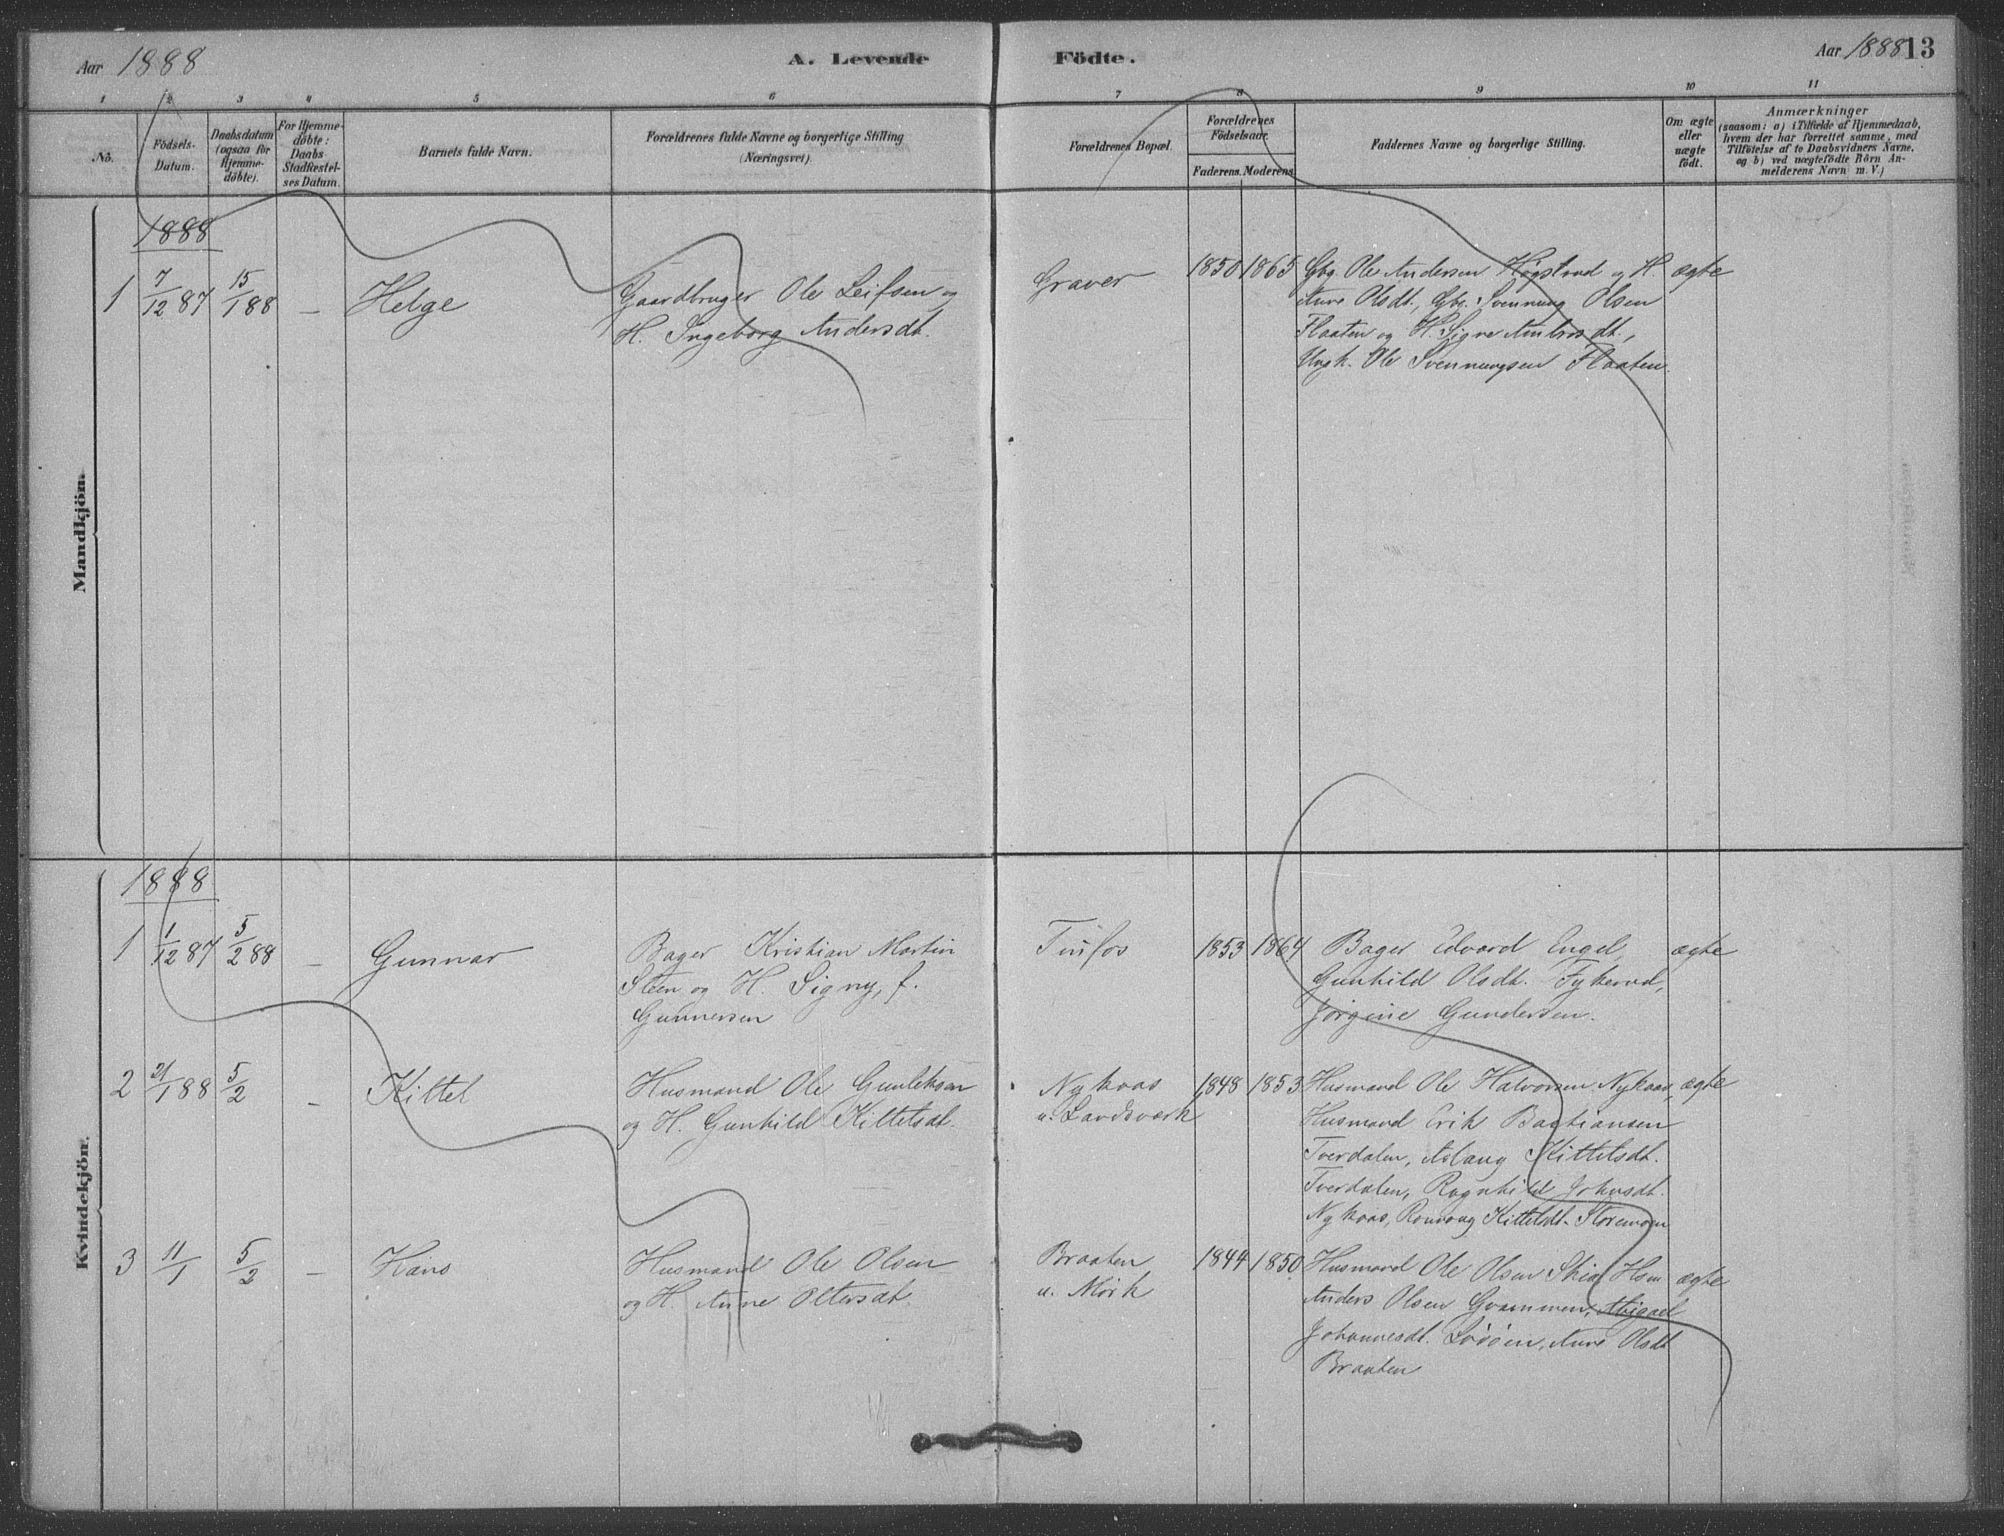 SAKO, Heddal kirkebøker, F/Fb/L0002: Ministerialbok nr. II 2, 1878-1913, s. 13